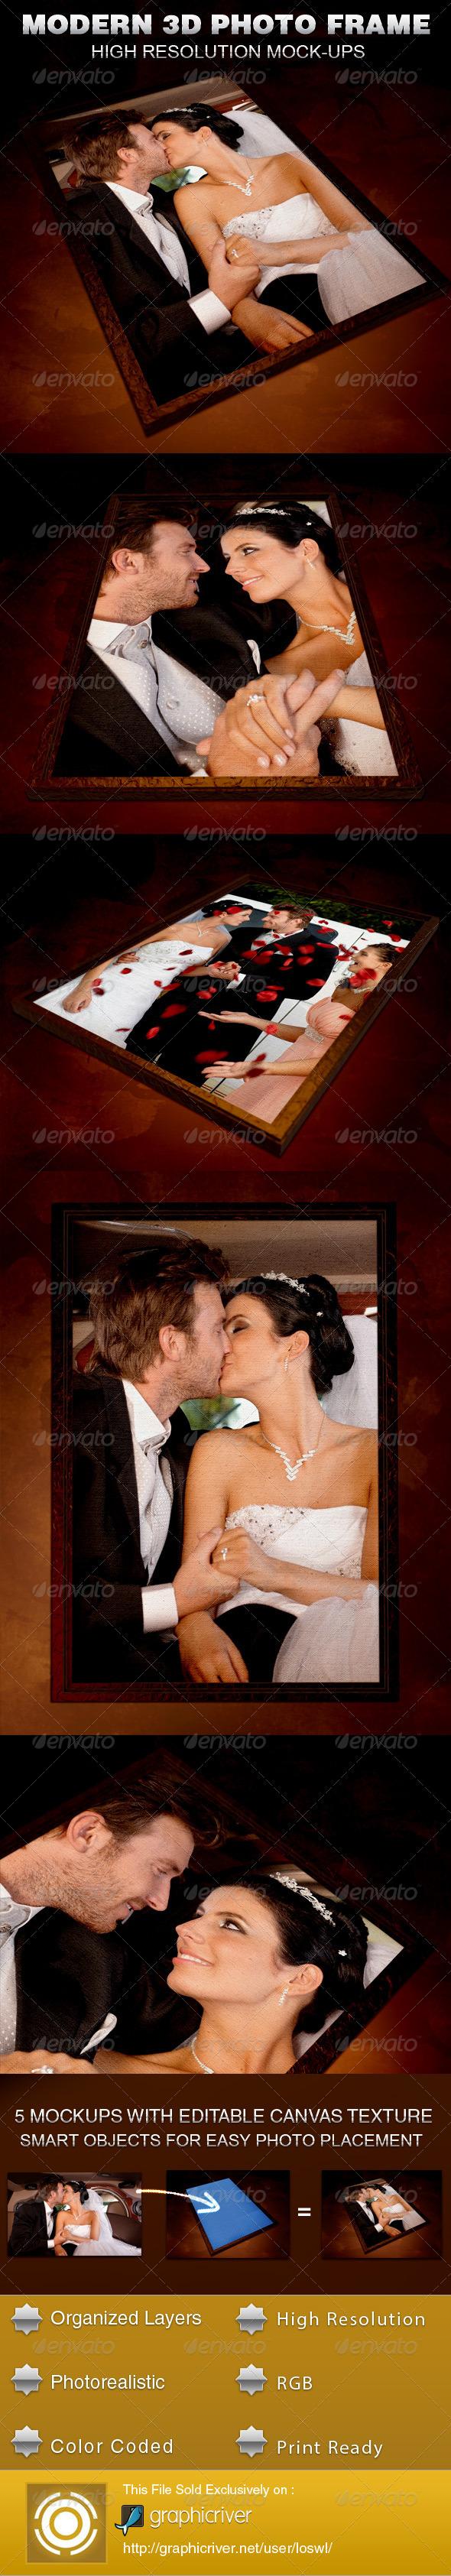 GraphicRiver Modern 3D Photo Frame Mockup Template 5377271